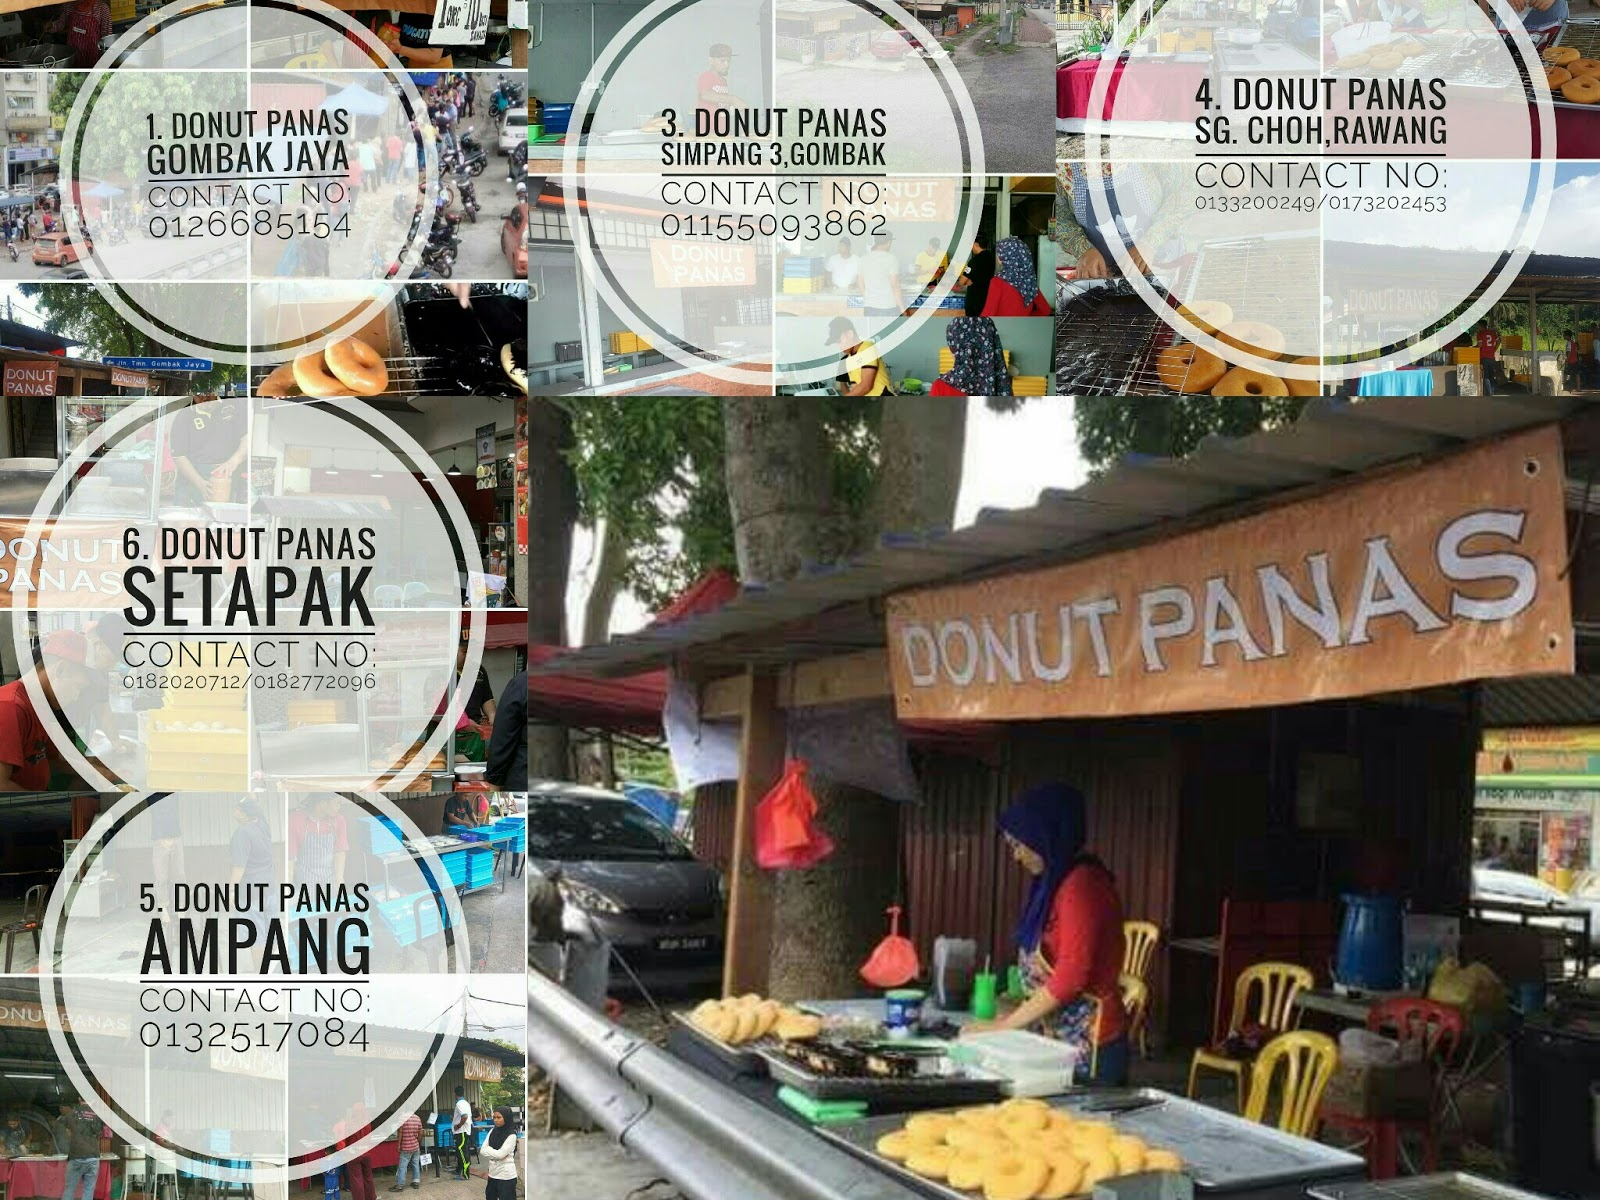 Donut Panas Gombak - Donut Viral